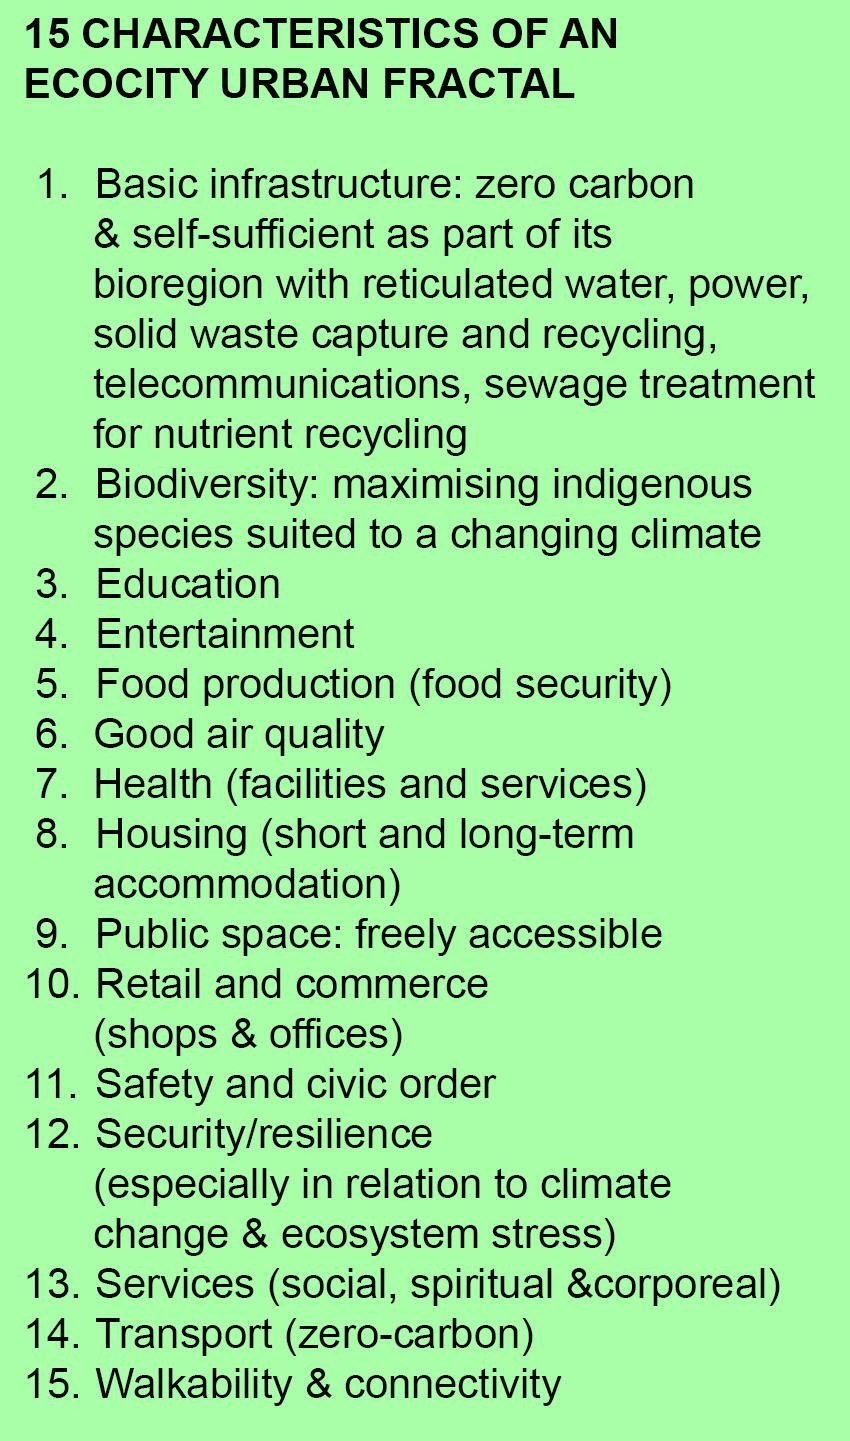 15 characteristics of ecocity fractal